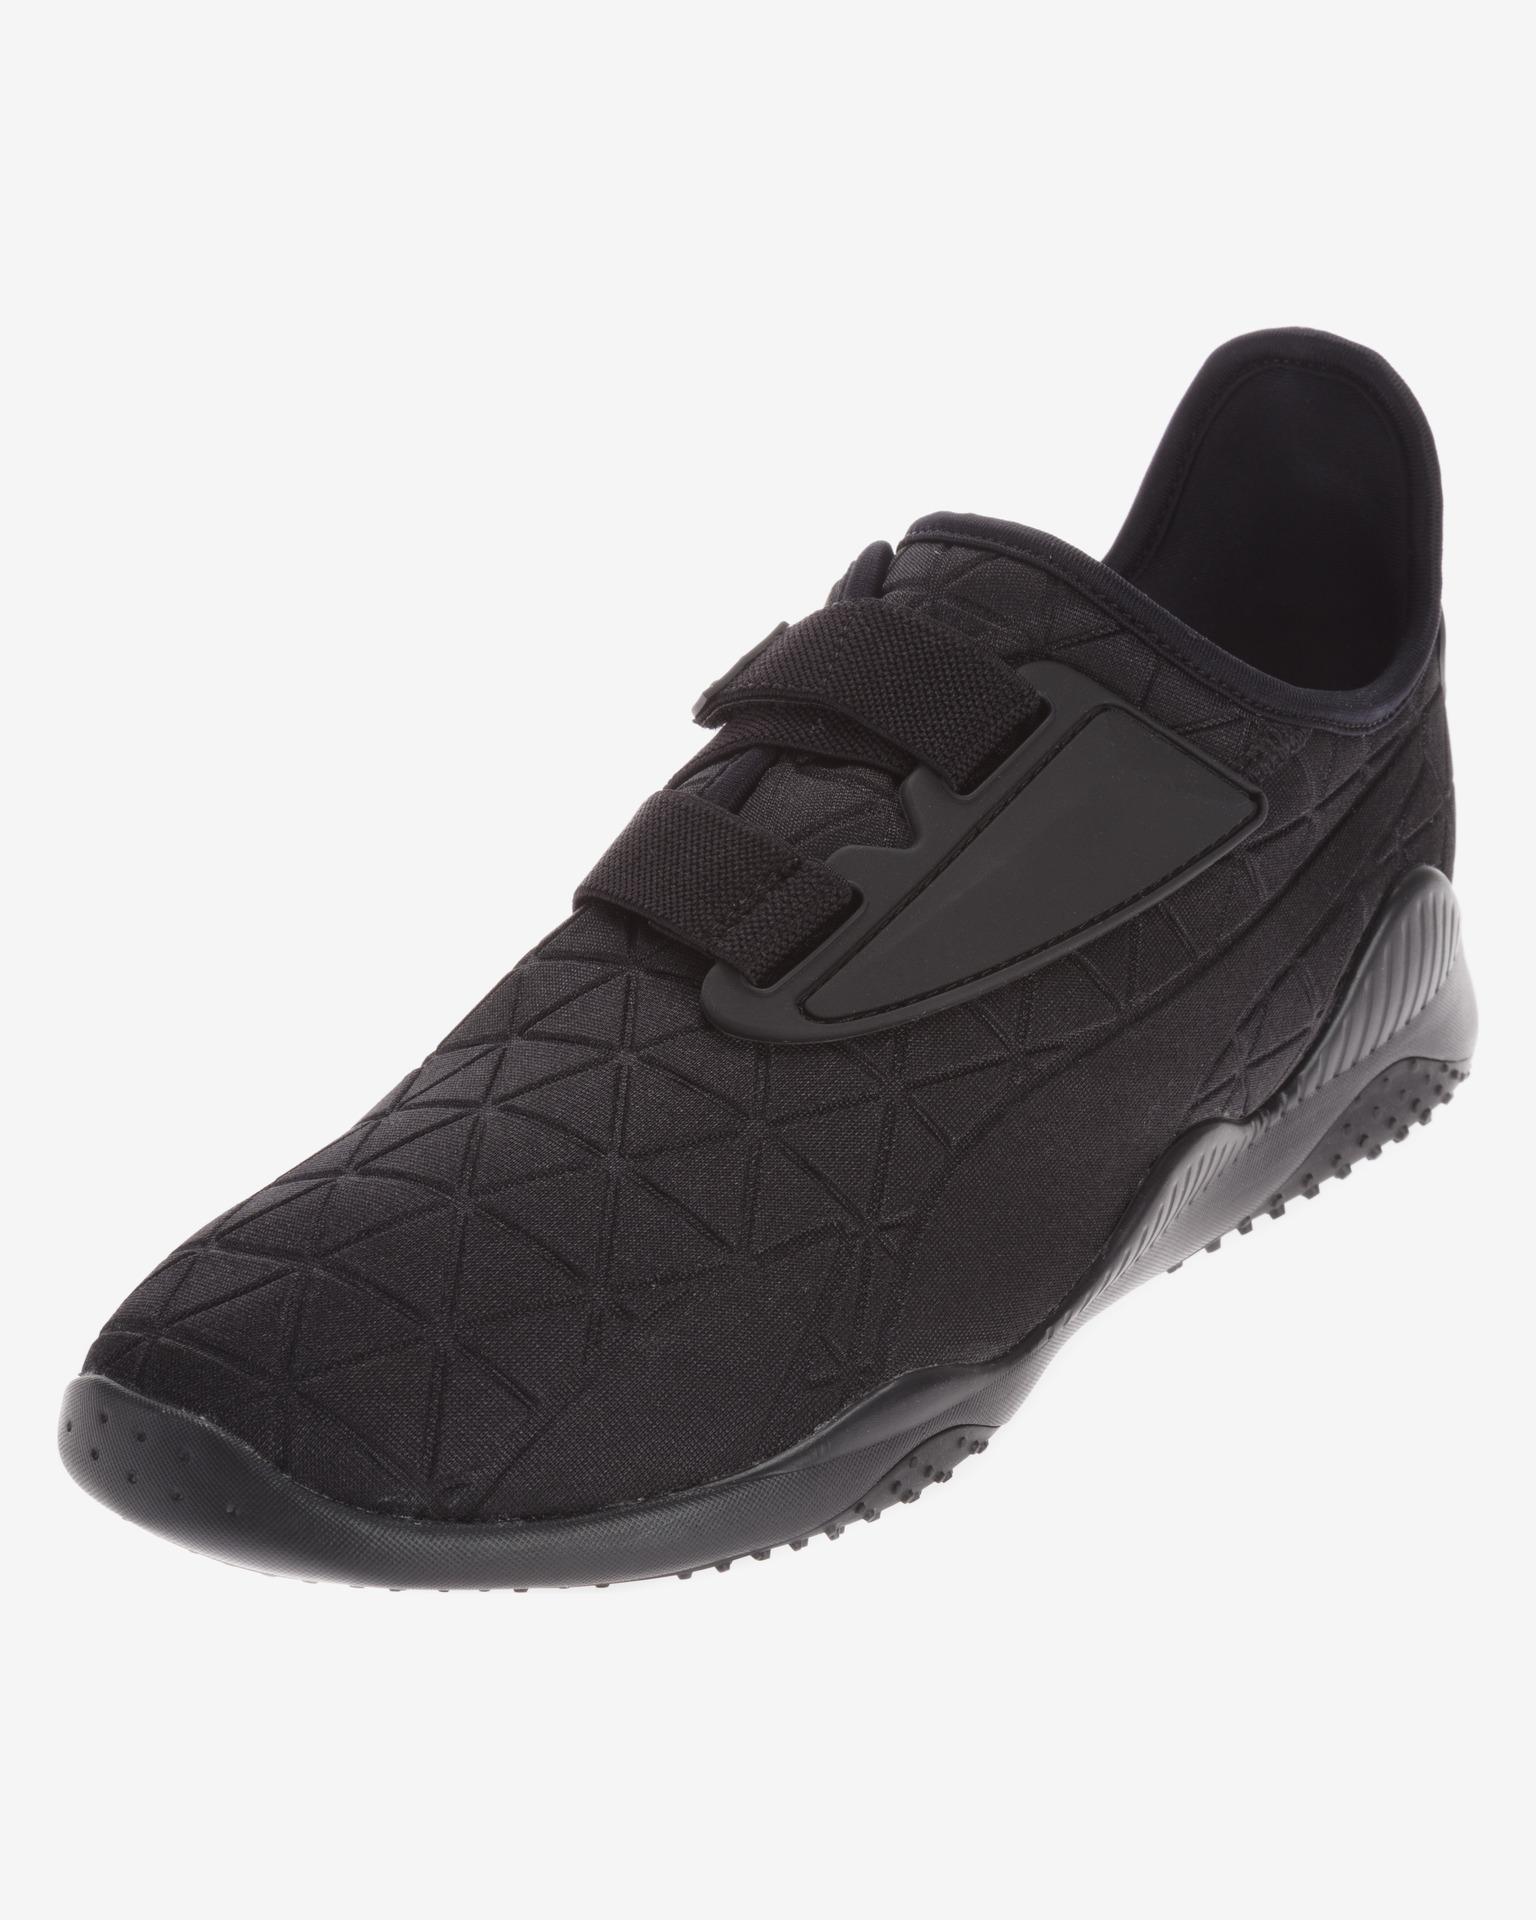 puma mostro nyfw sneakers GVJKLAR